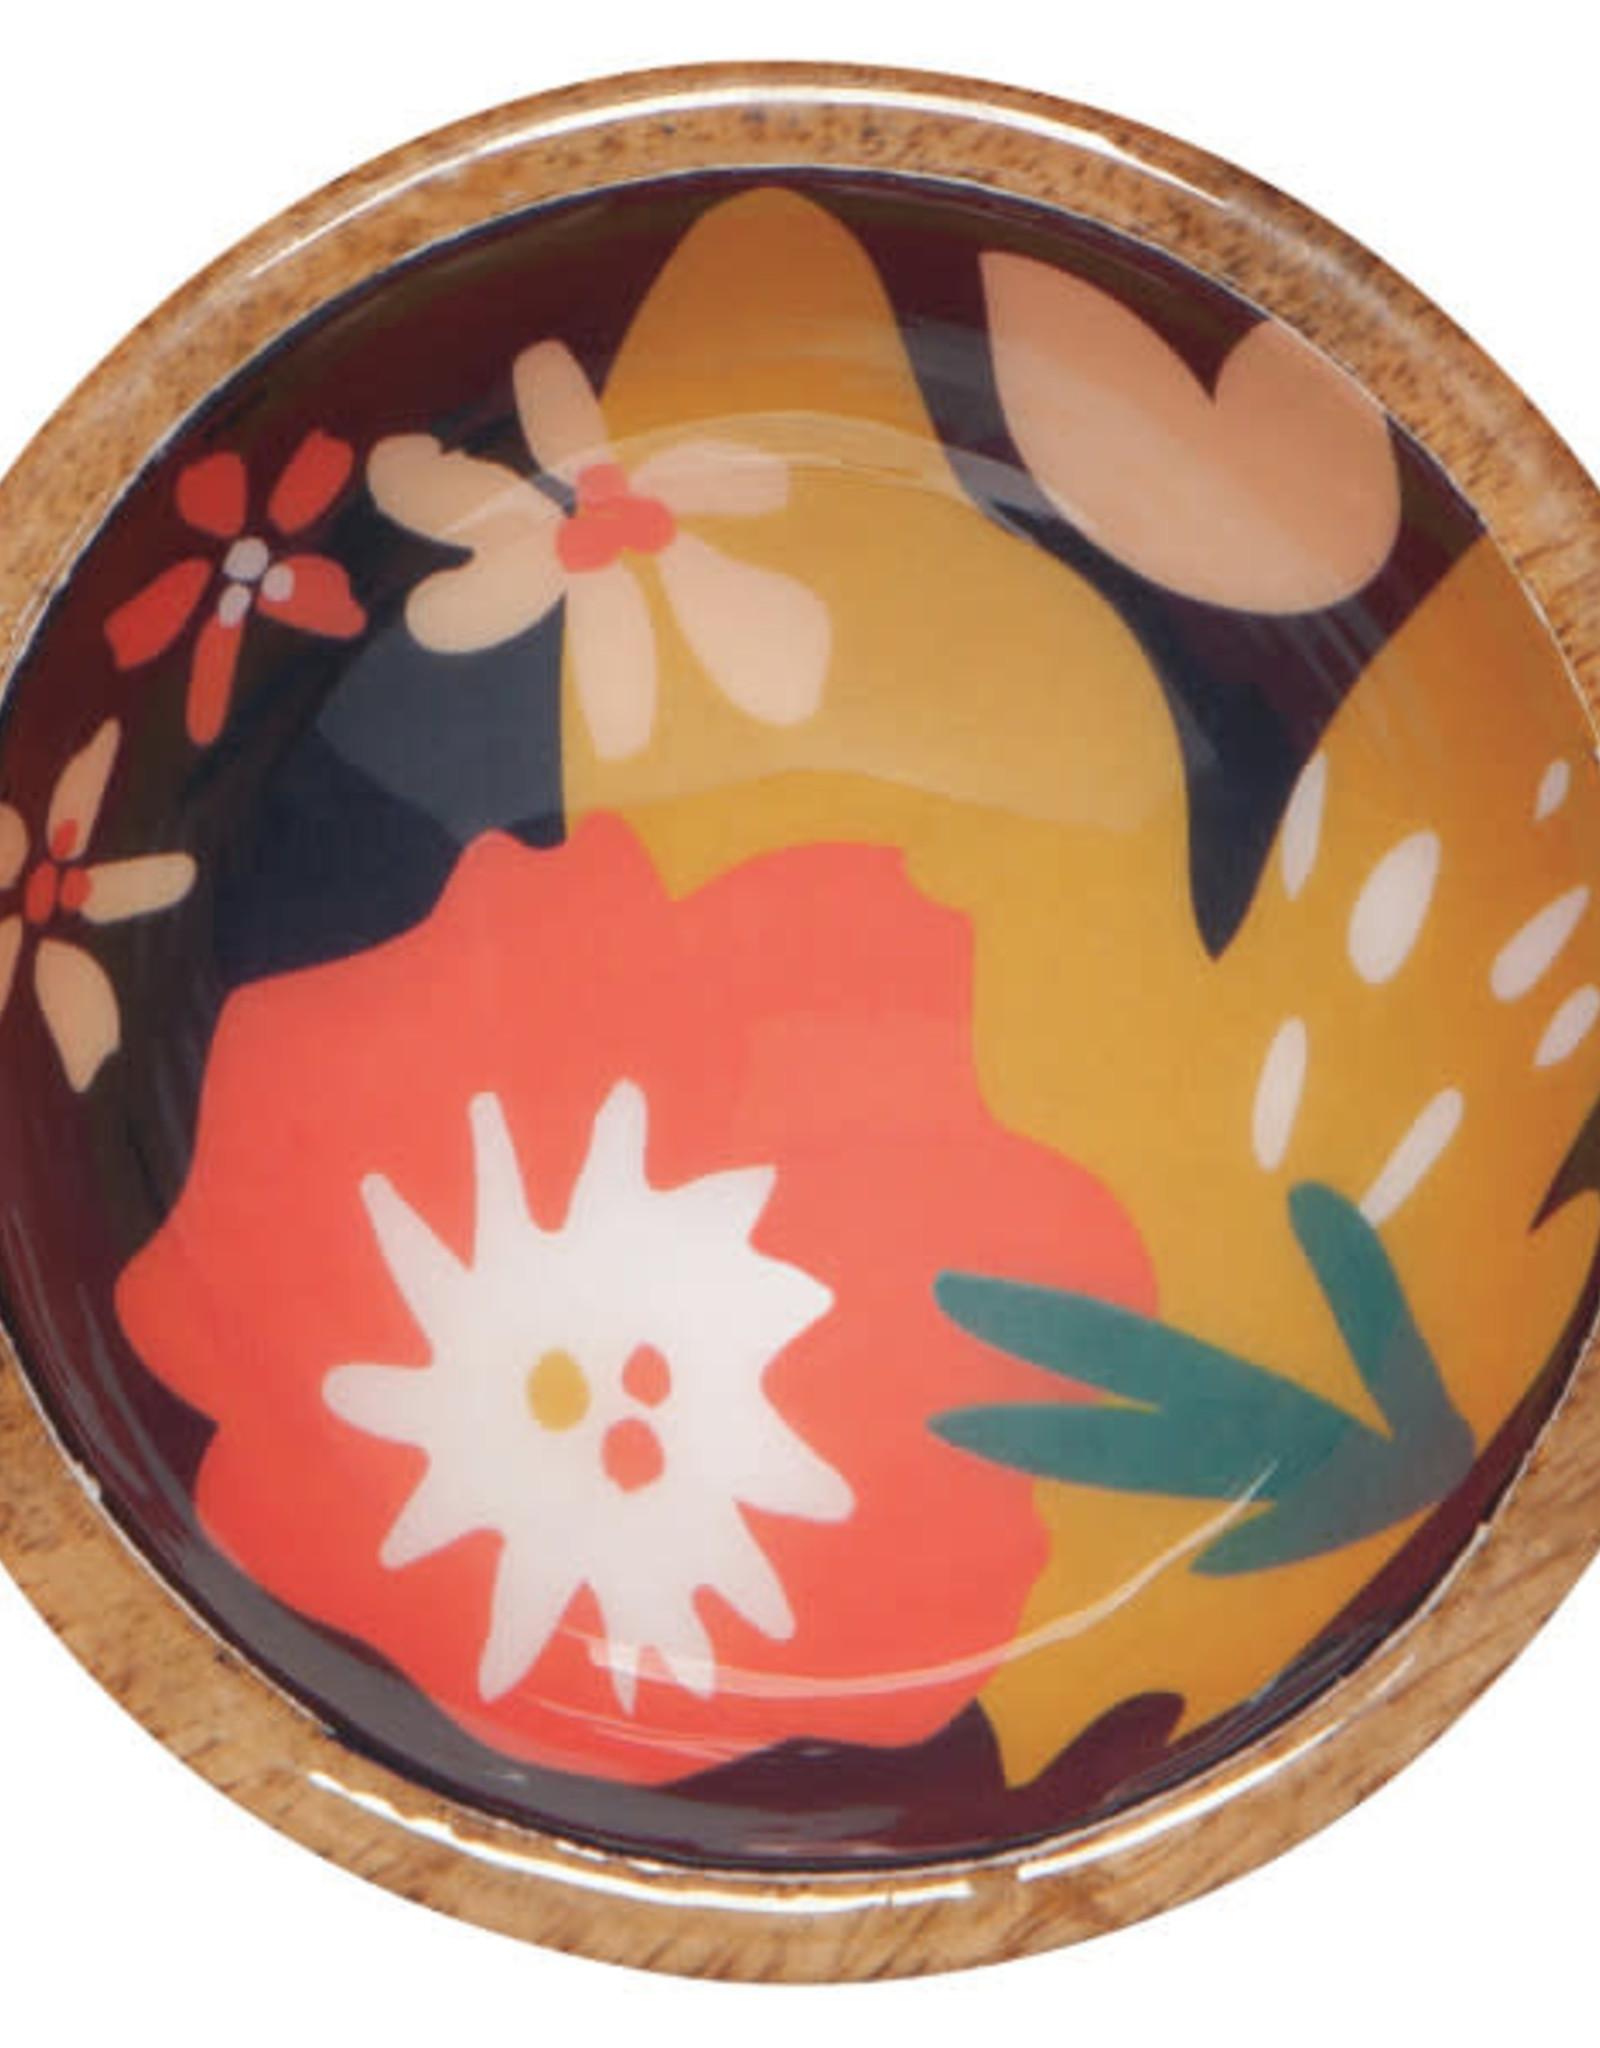 Bol 4'' en bois de manguier - Superbloom